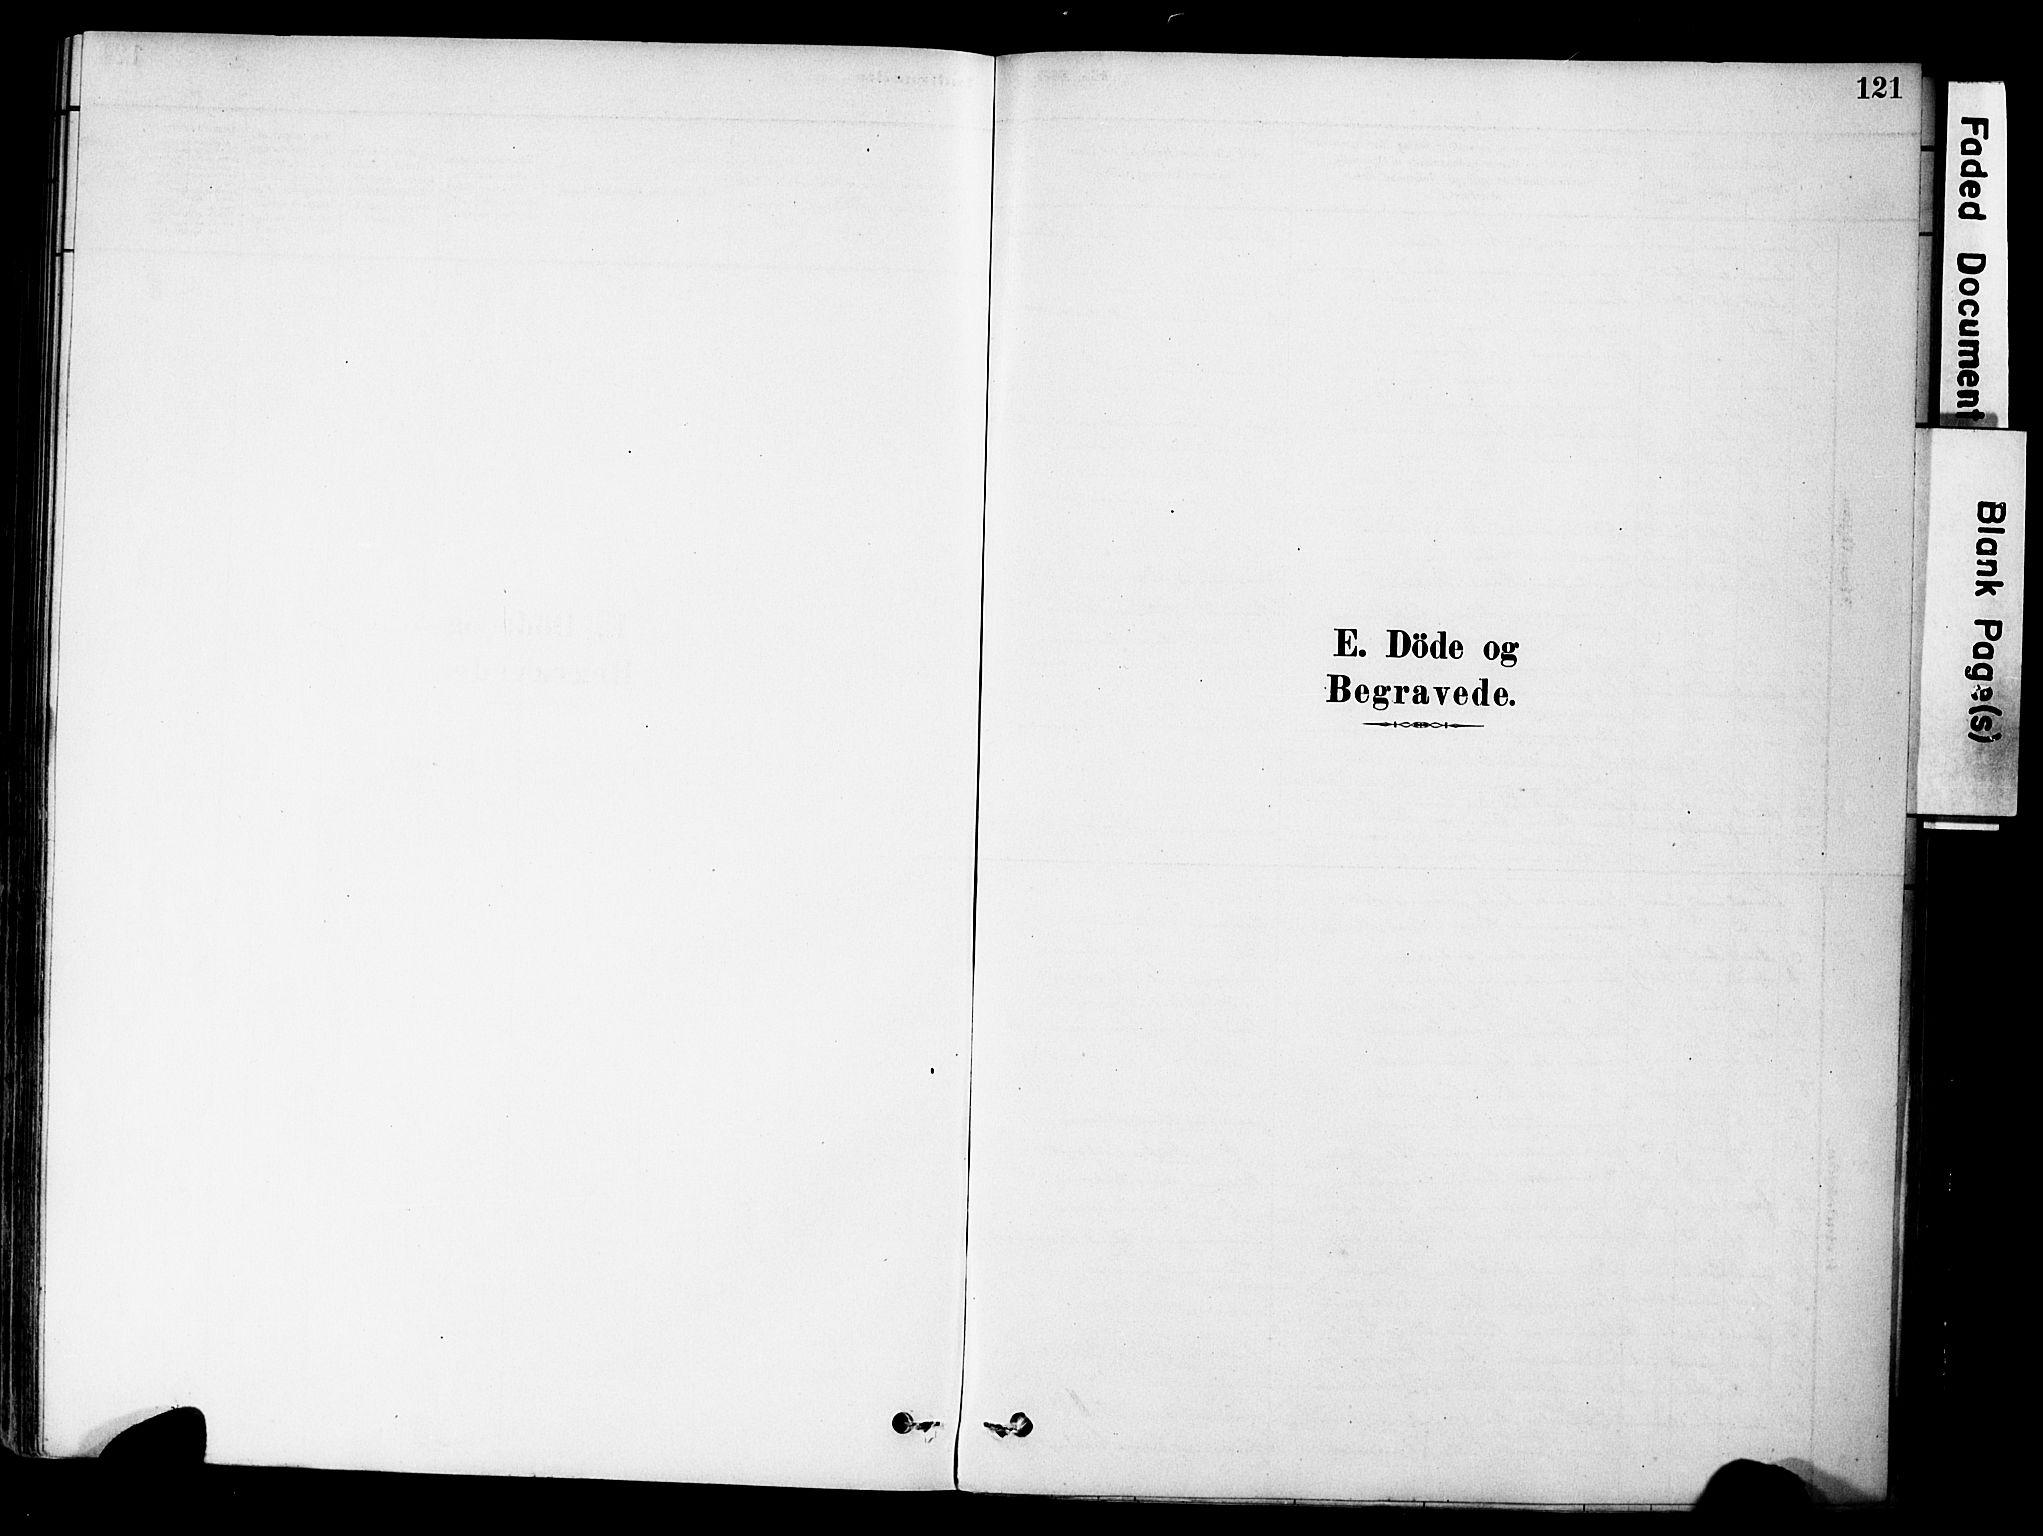 SAH, Øyer prestekontor, Ministerialbok nr. 9, 1878-1893, s. 121